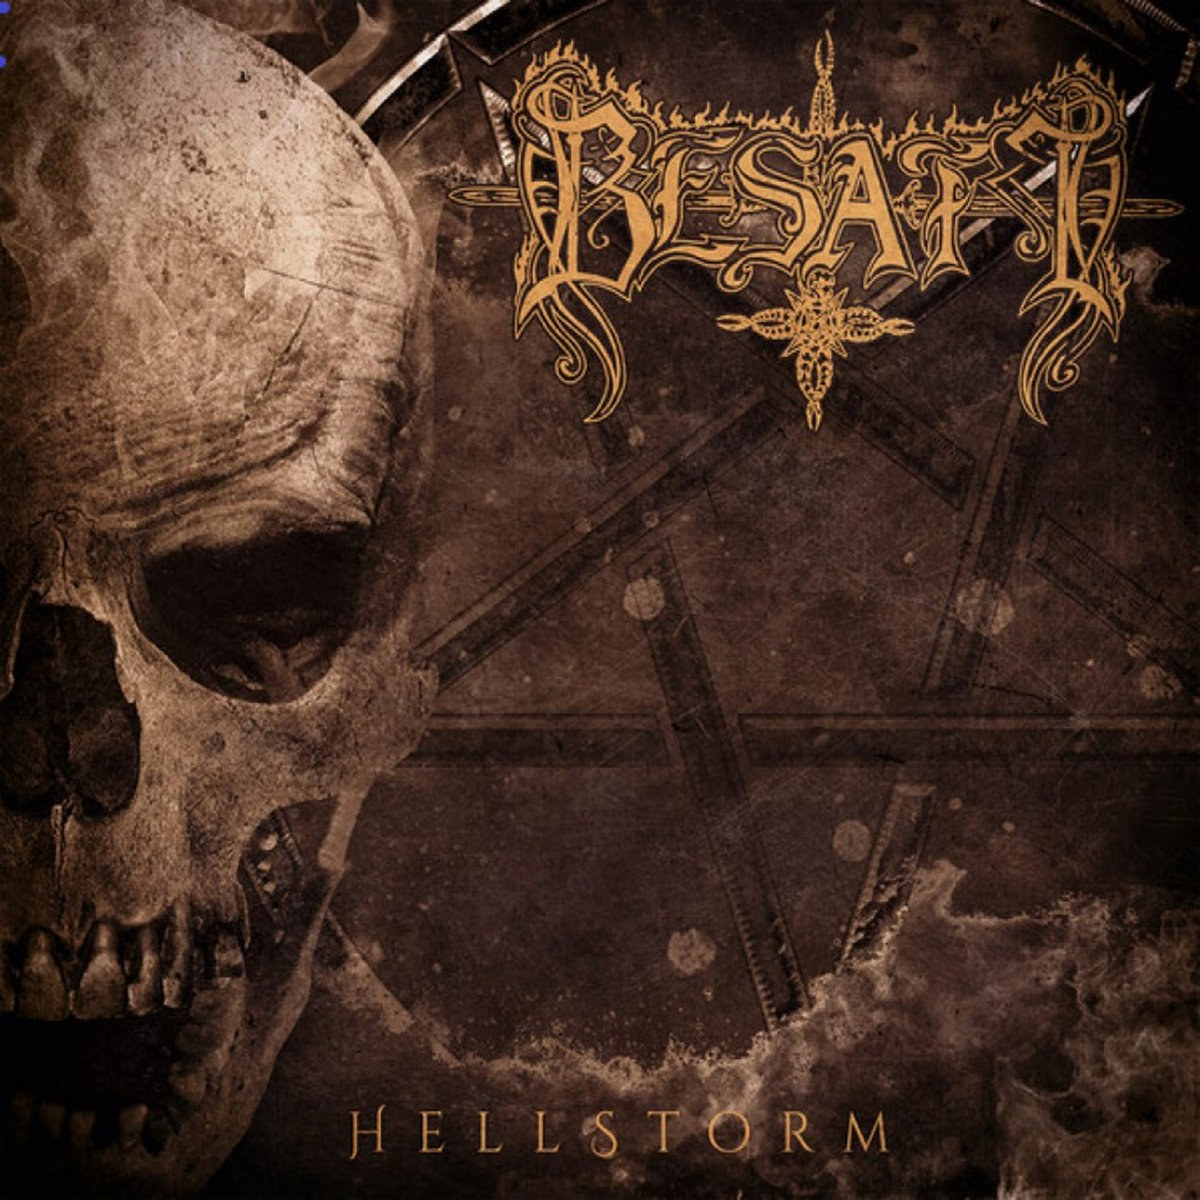 Review for Besatt - Hellstorm